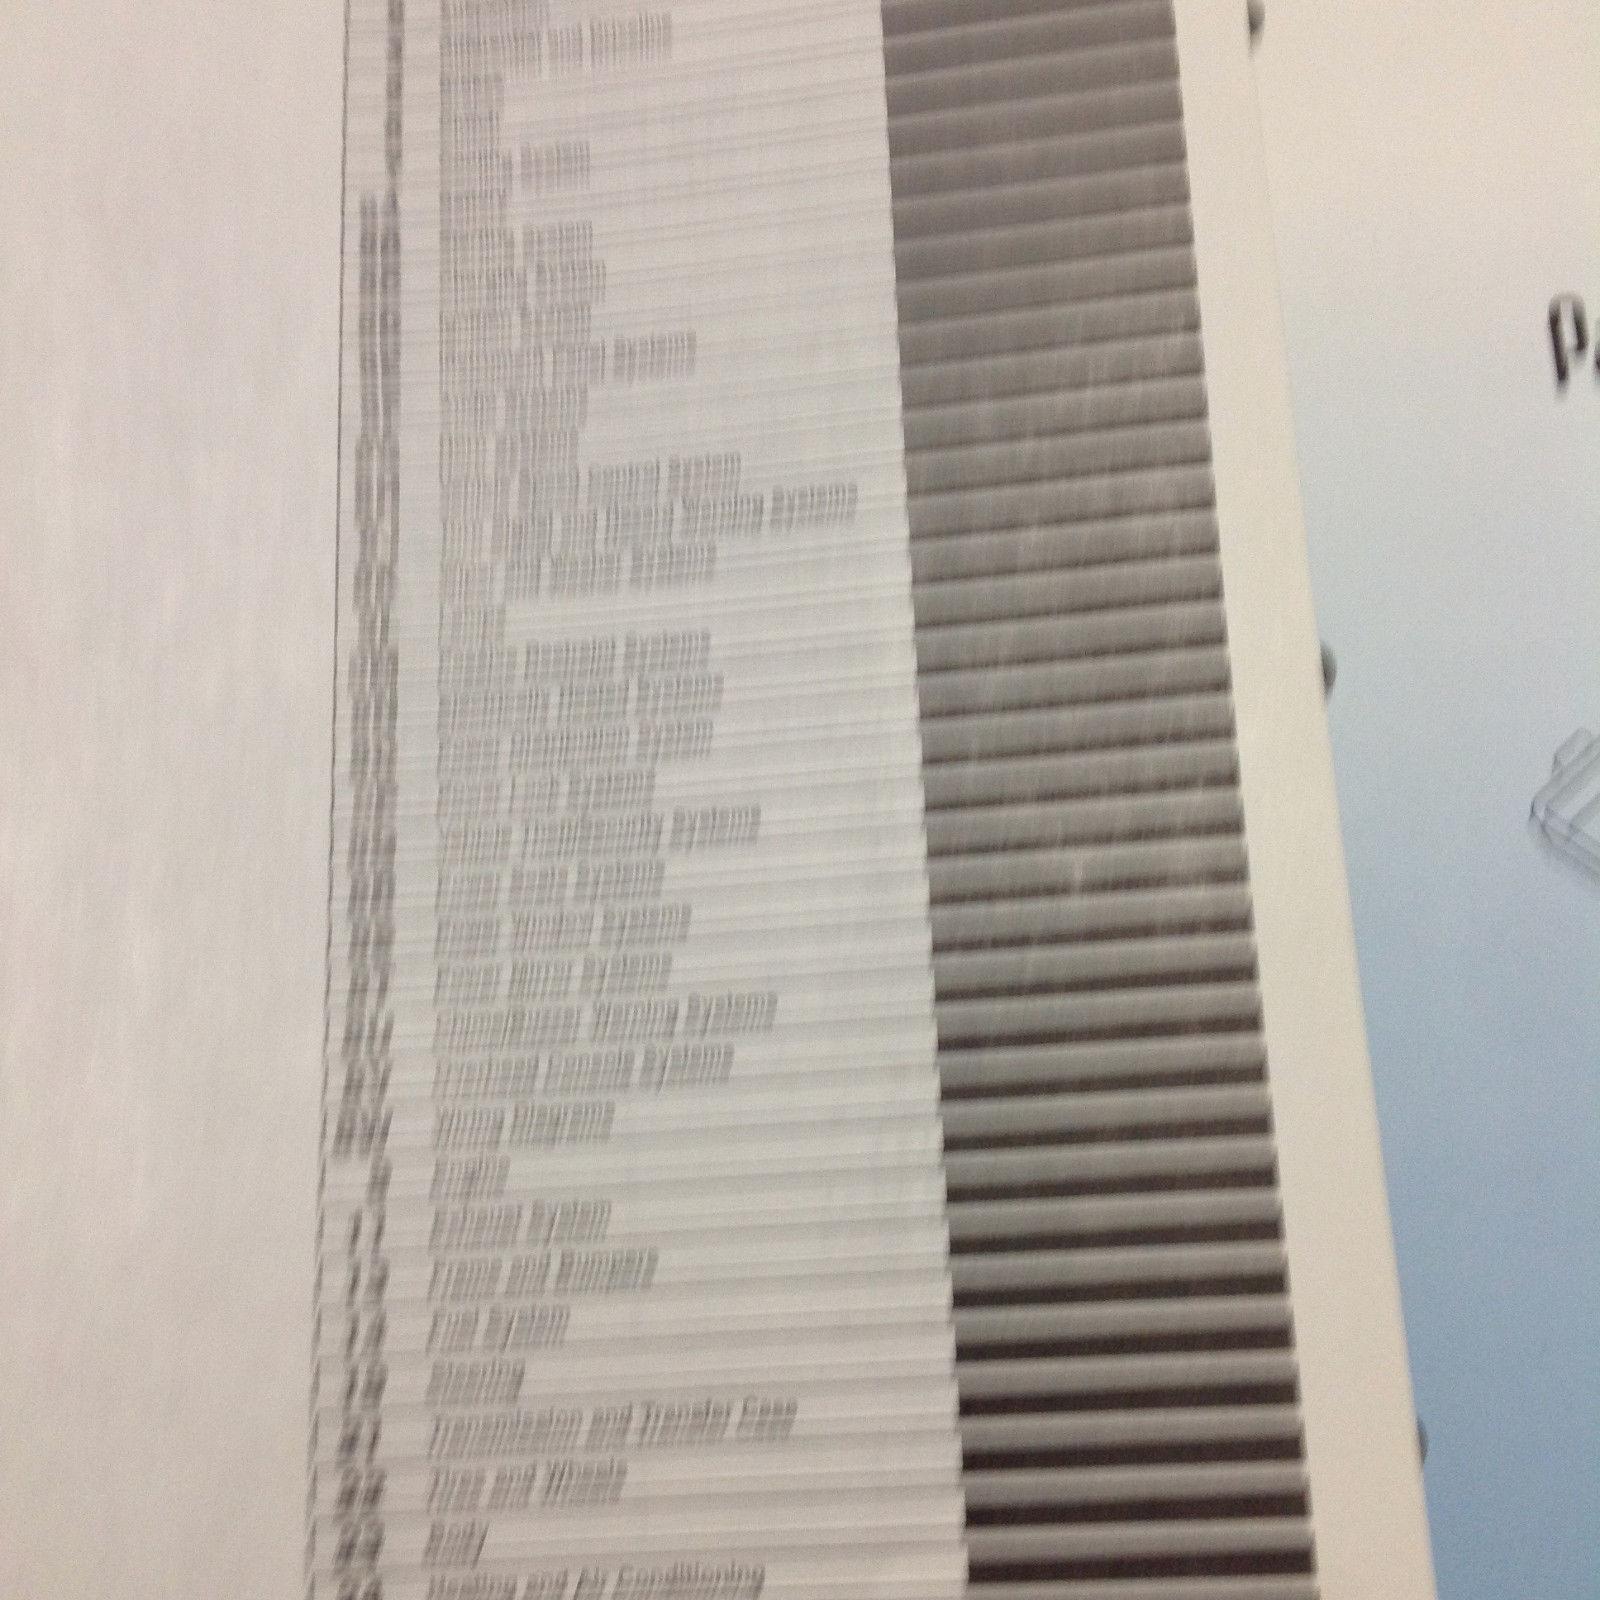 2000 JEEP CHEROKEE Service Repair Shop Manual Set W Training Literature Mopar